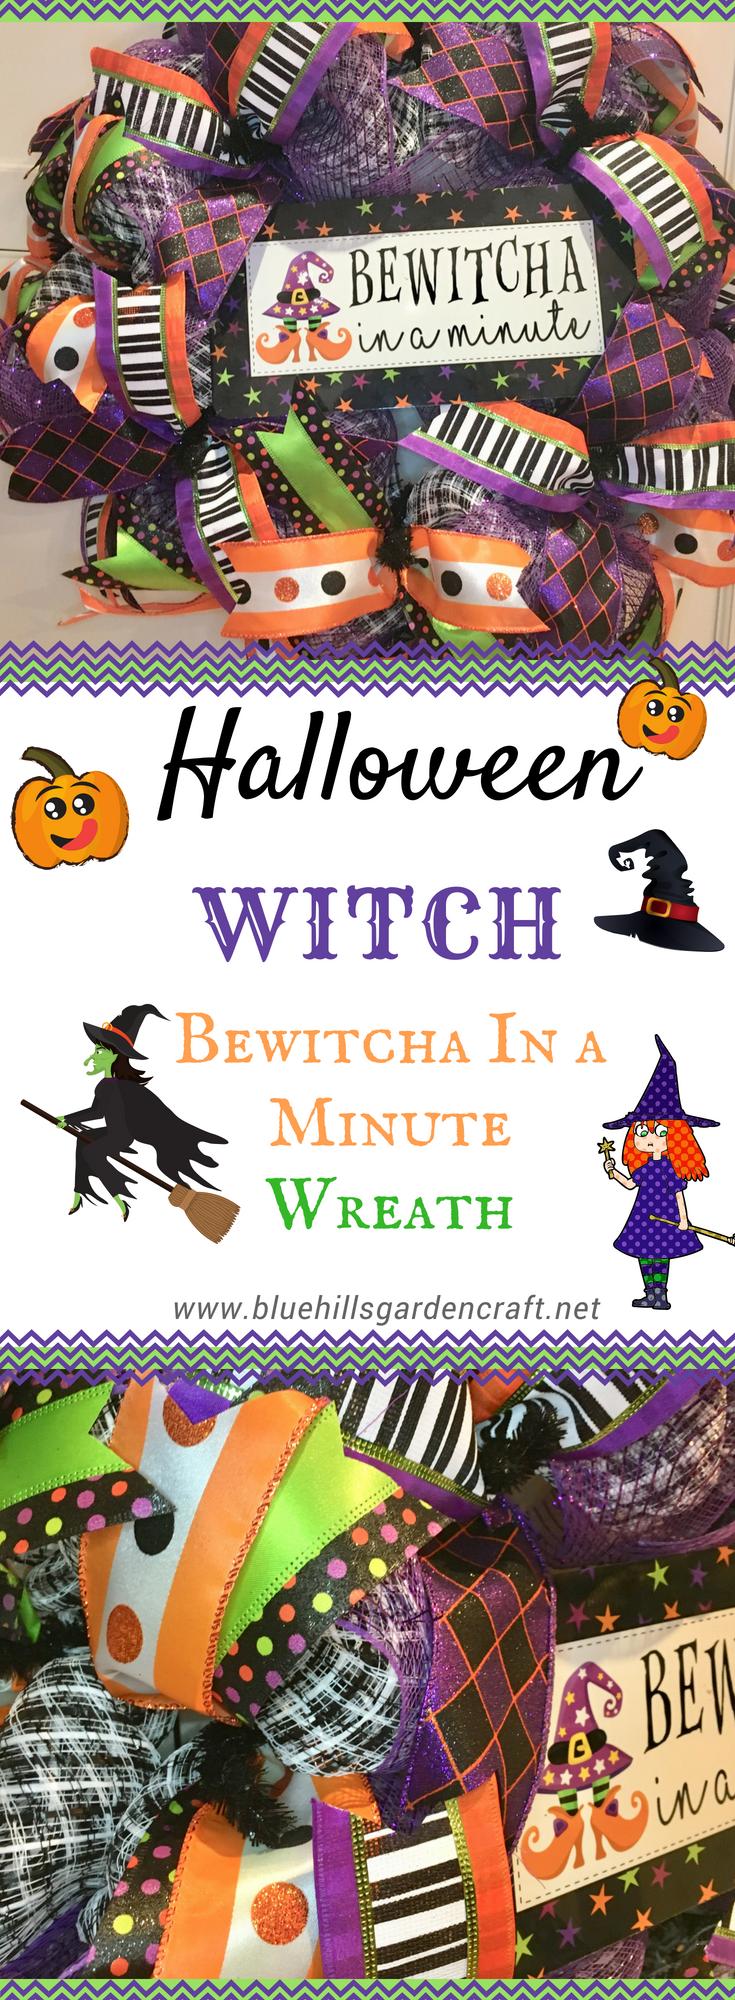 Halloween Wreath Bewitcha In A Minute Decor Halloween Decor Purple Door Decor Custom Door Wreath Witch Wreath Witch Hat Halloween Halloween Wreath Wreaths Door Decorations